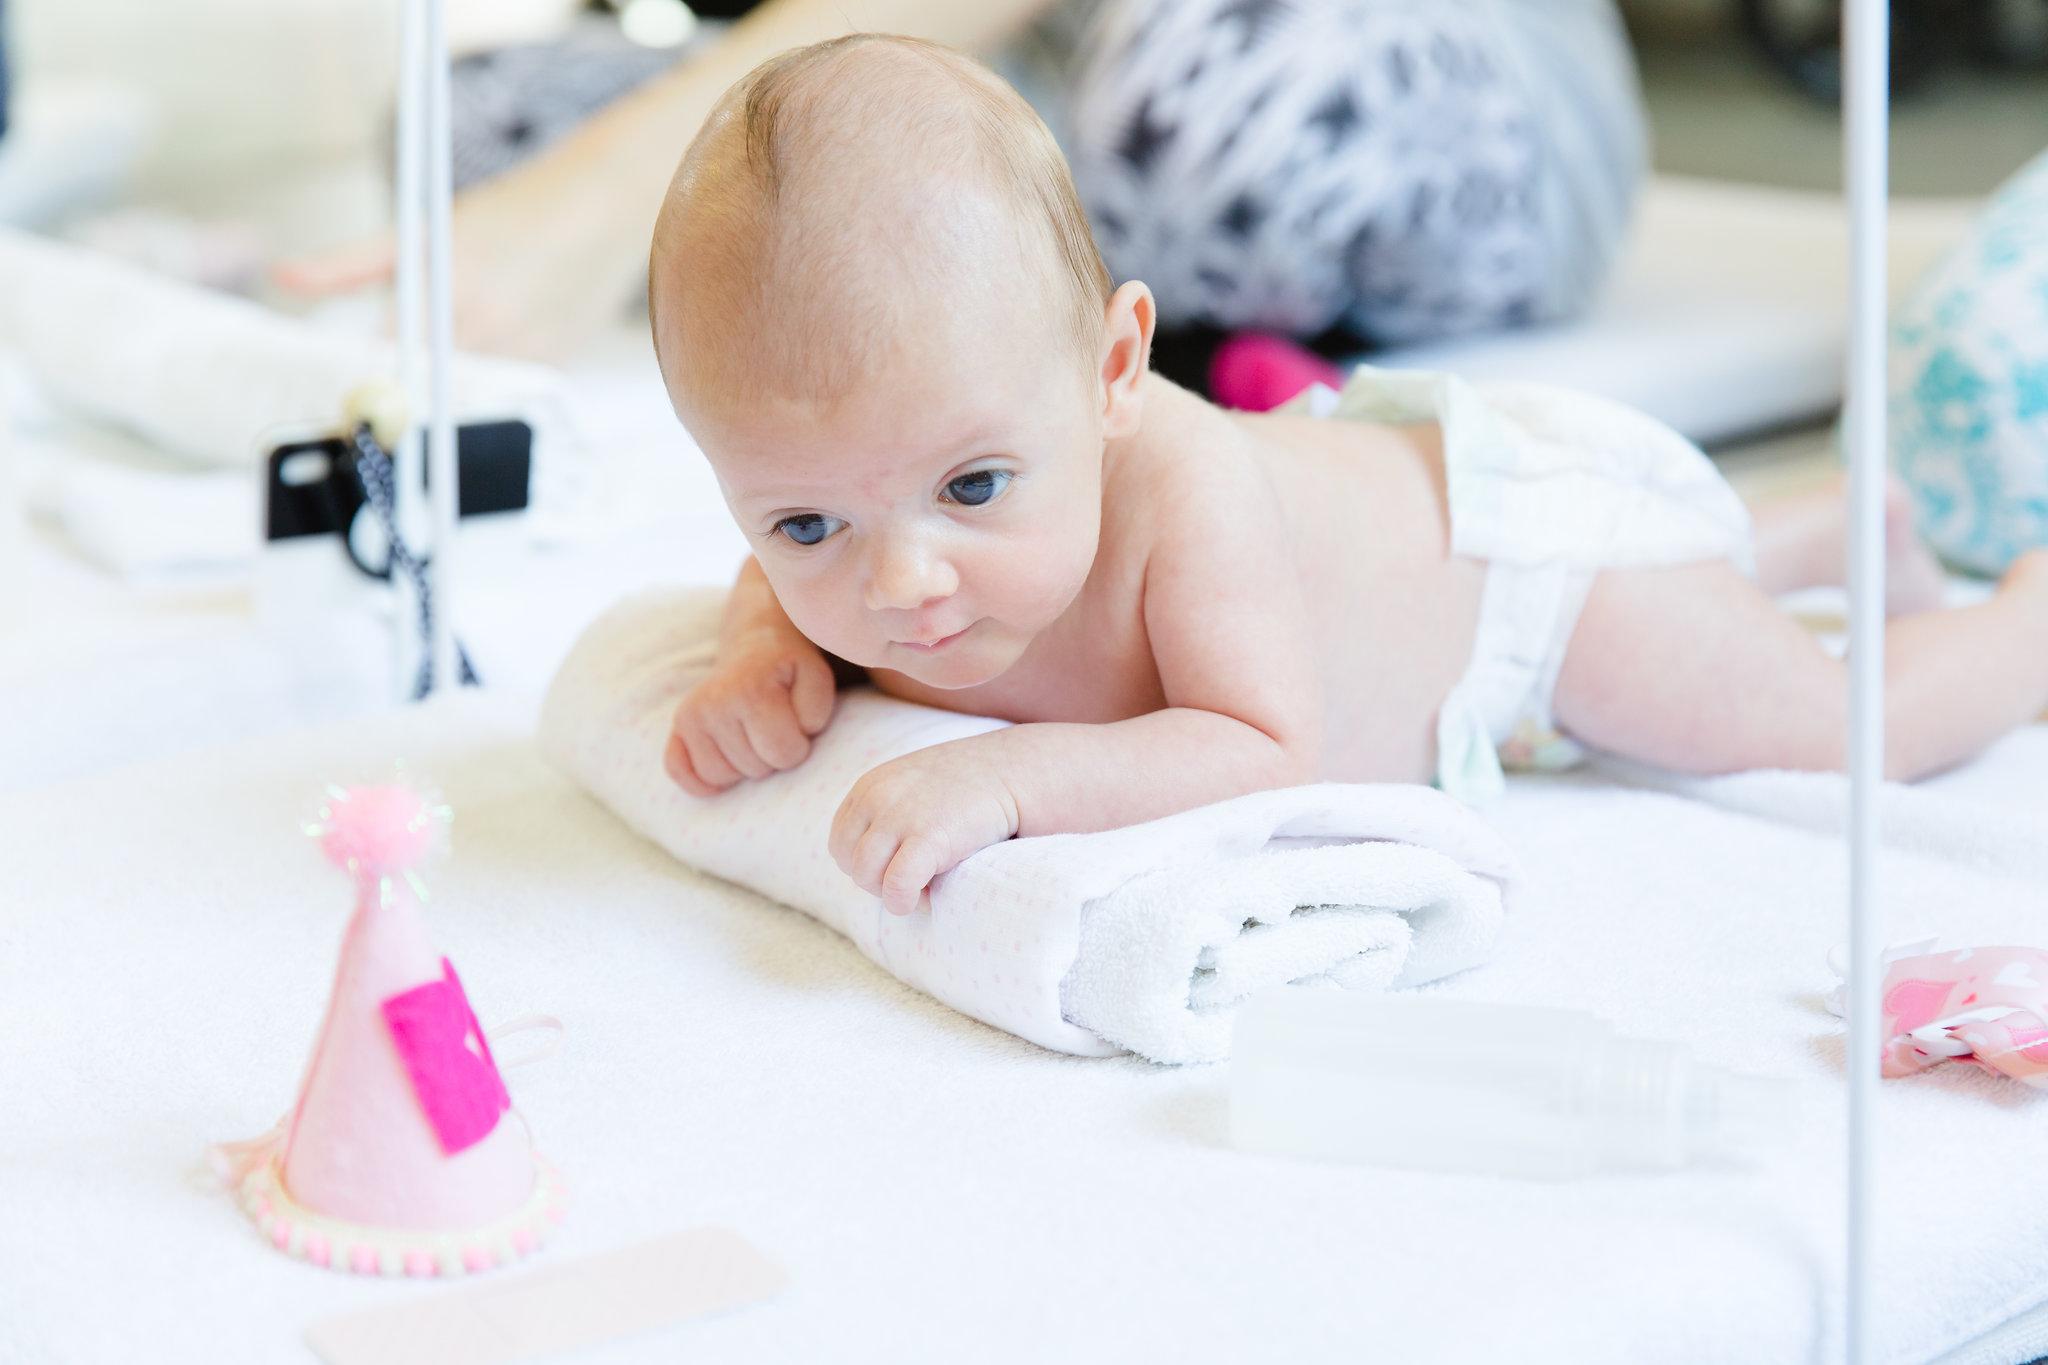 Baby Stimulation